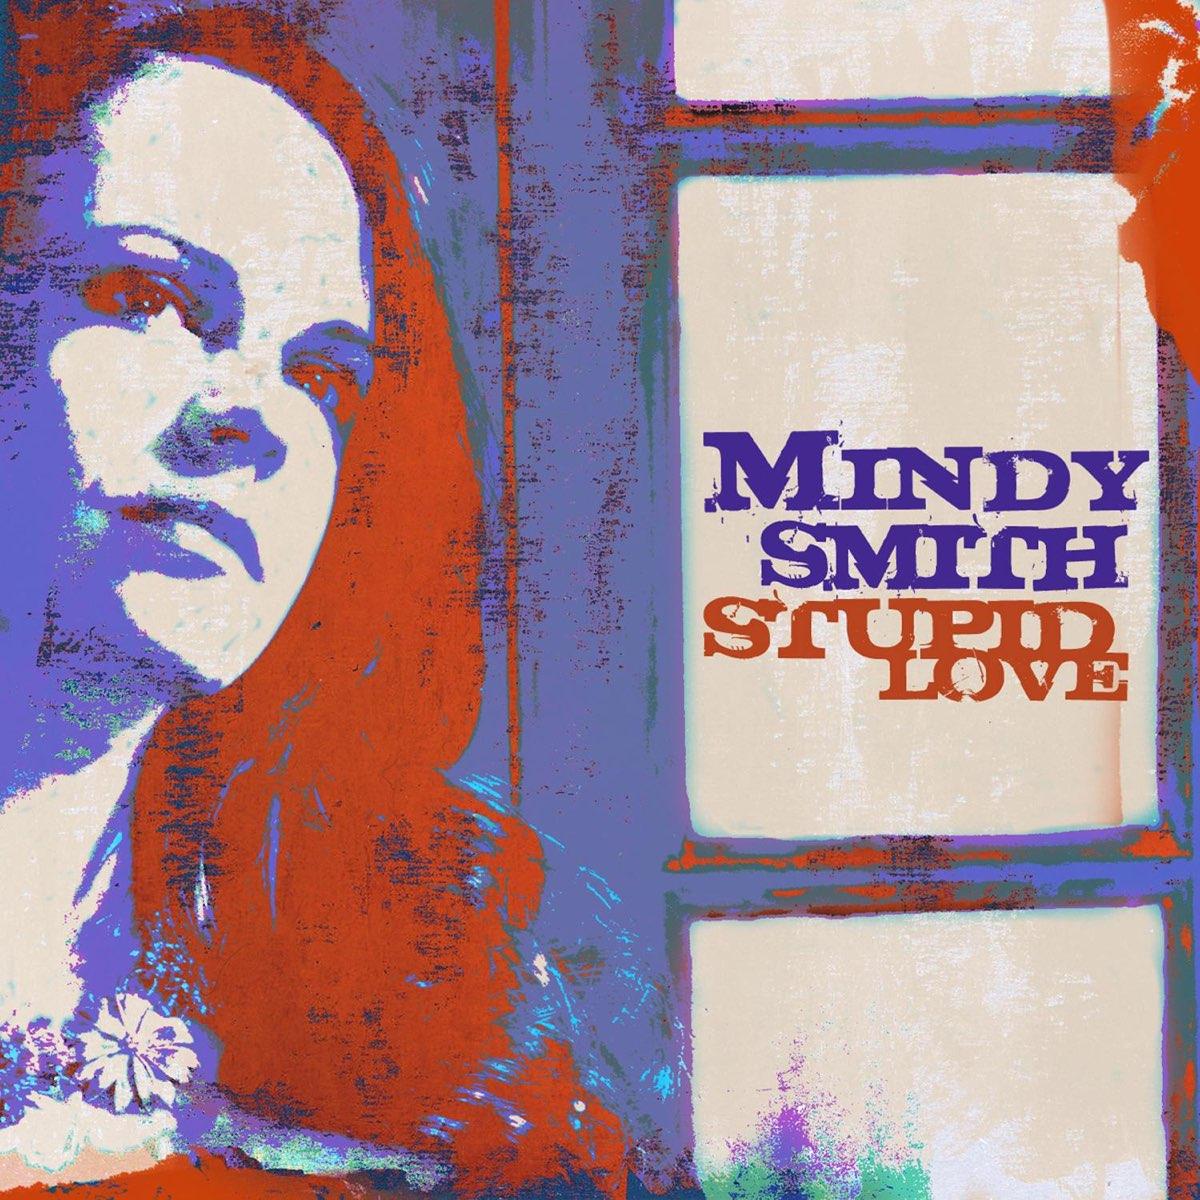 Mindy Smith, Stupid Love